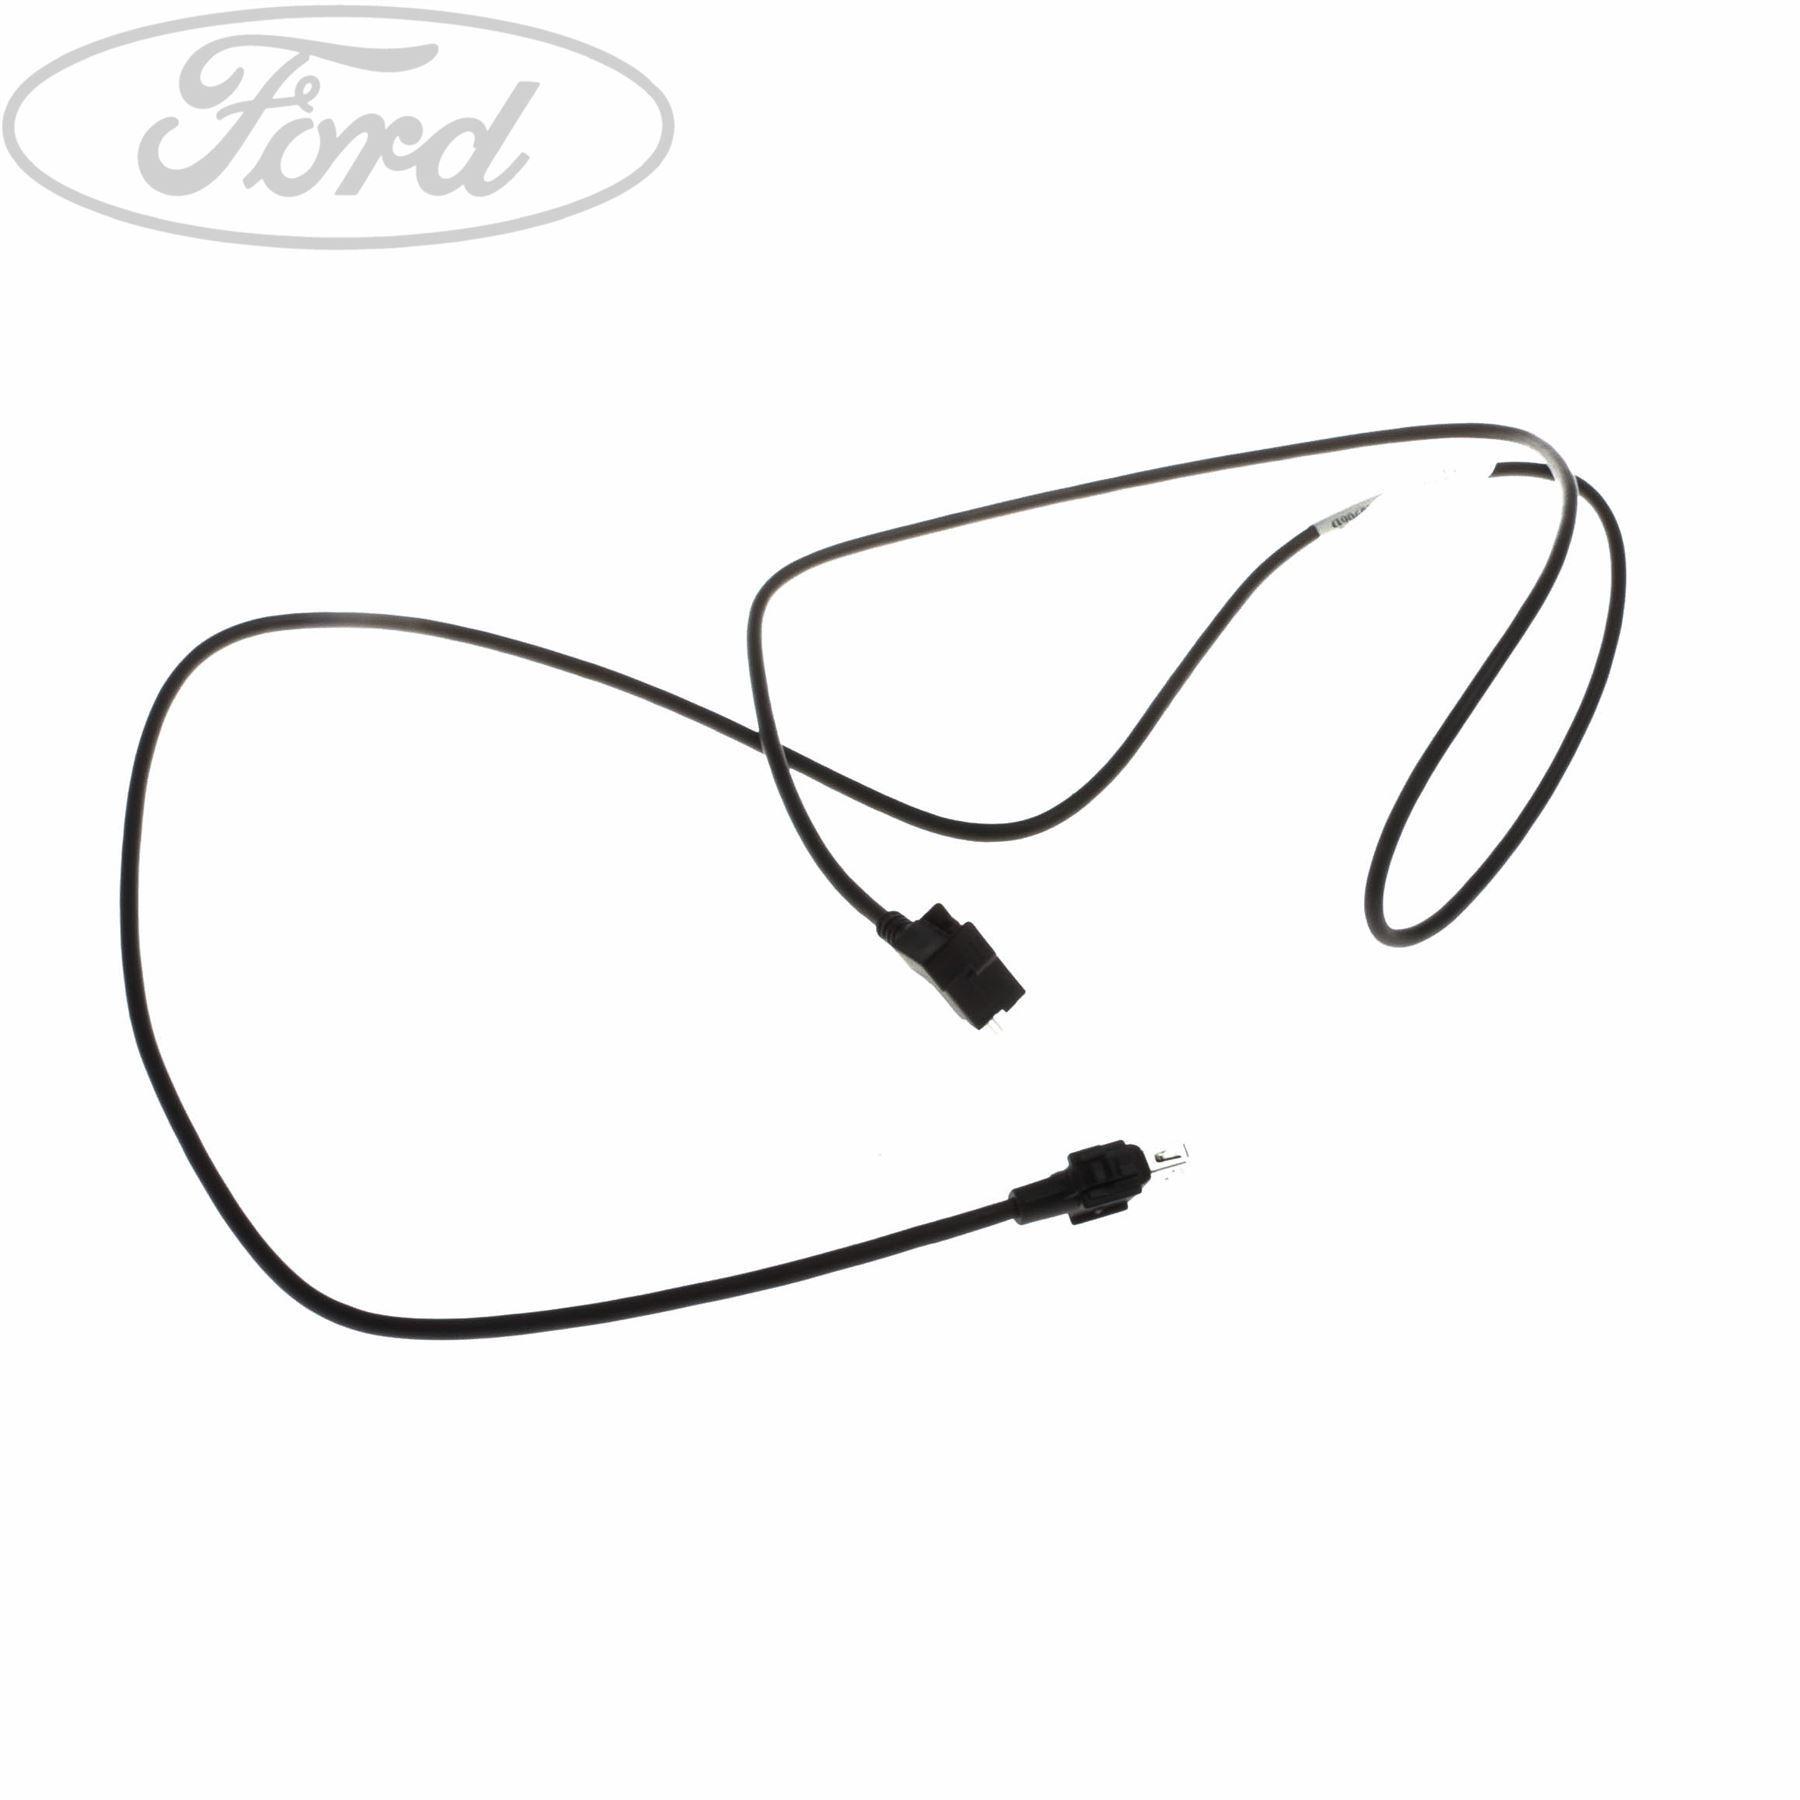 Genuine Ford Fiesta Mk7 Dashboard Usb Wire Cable